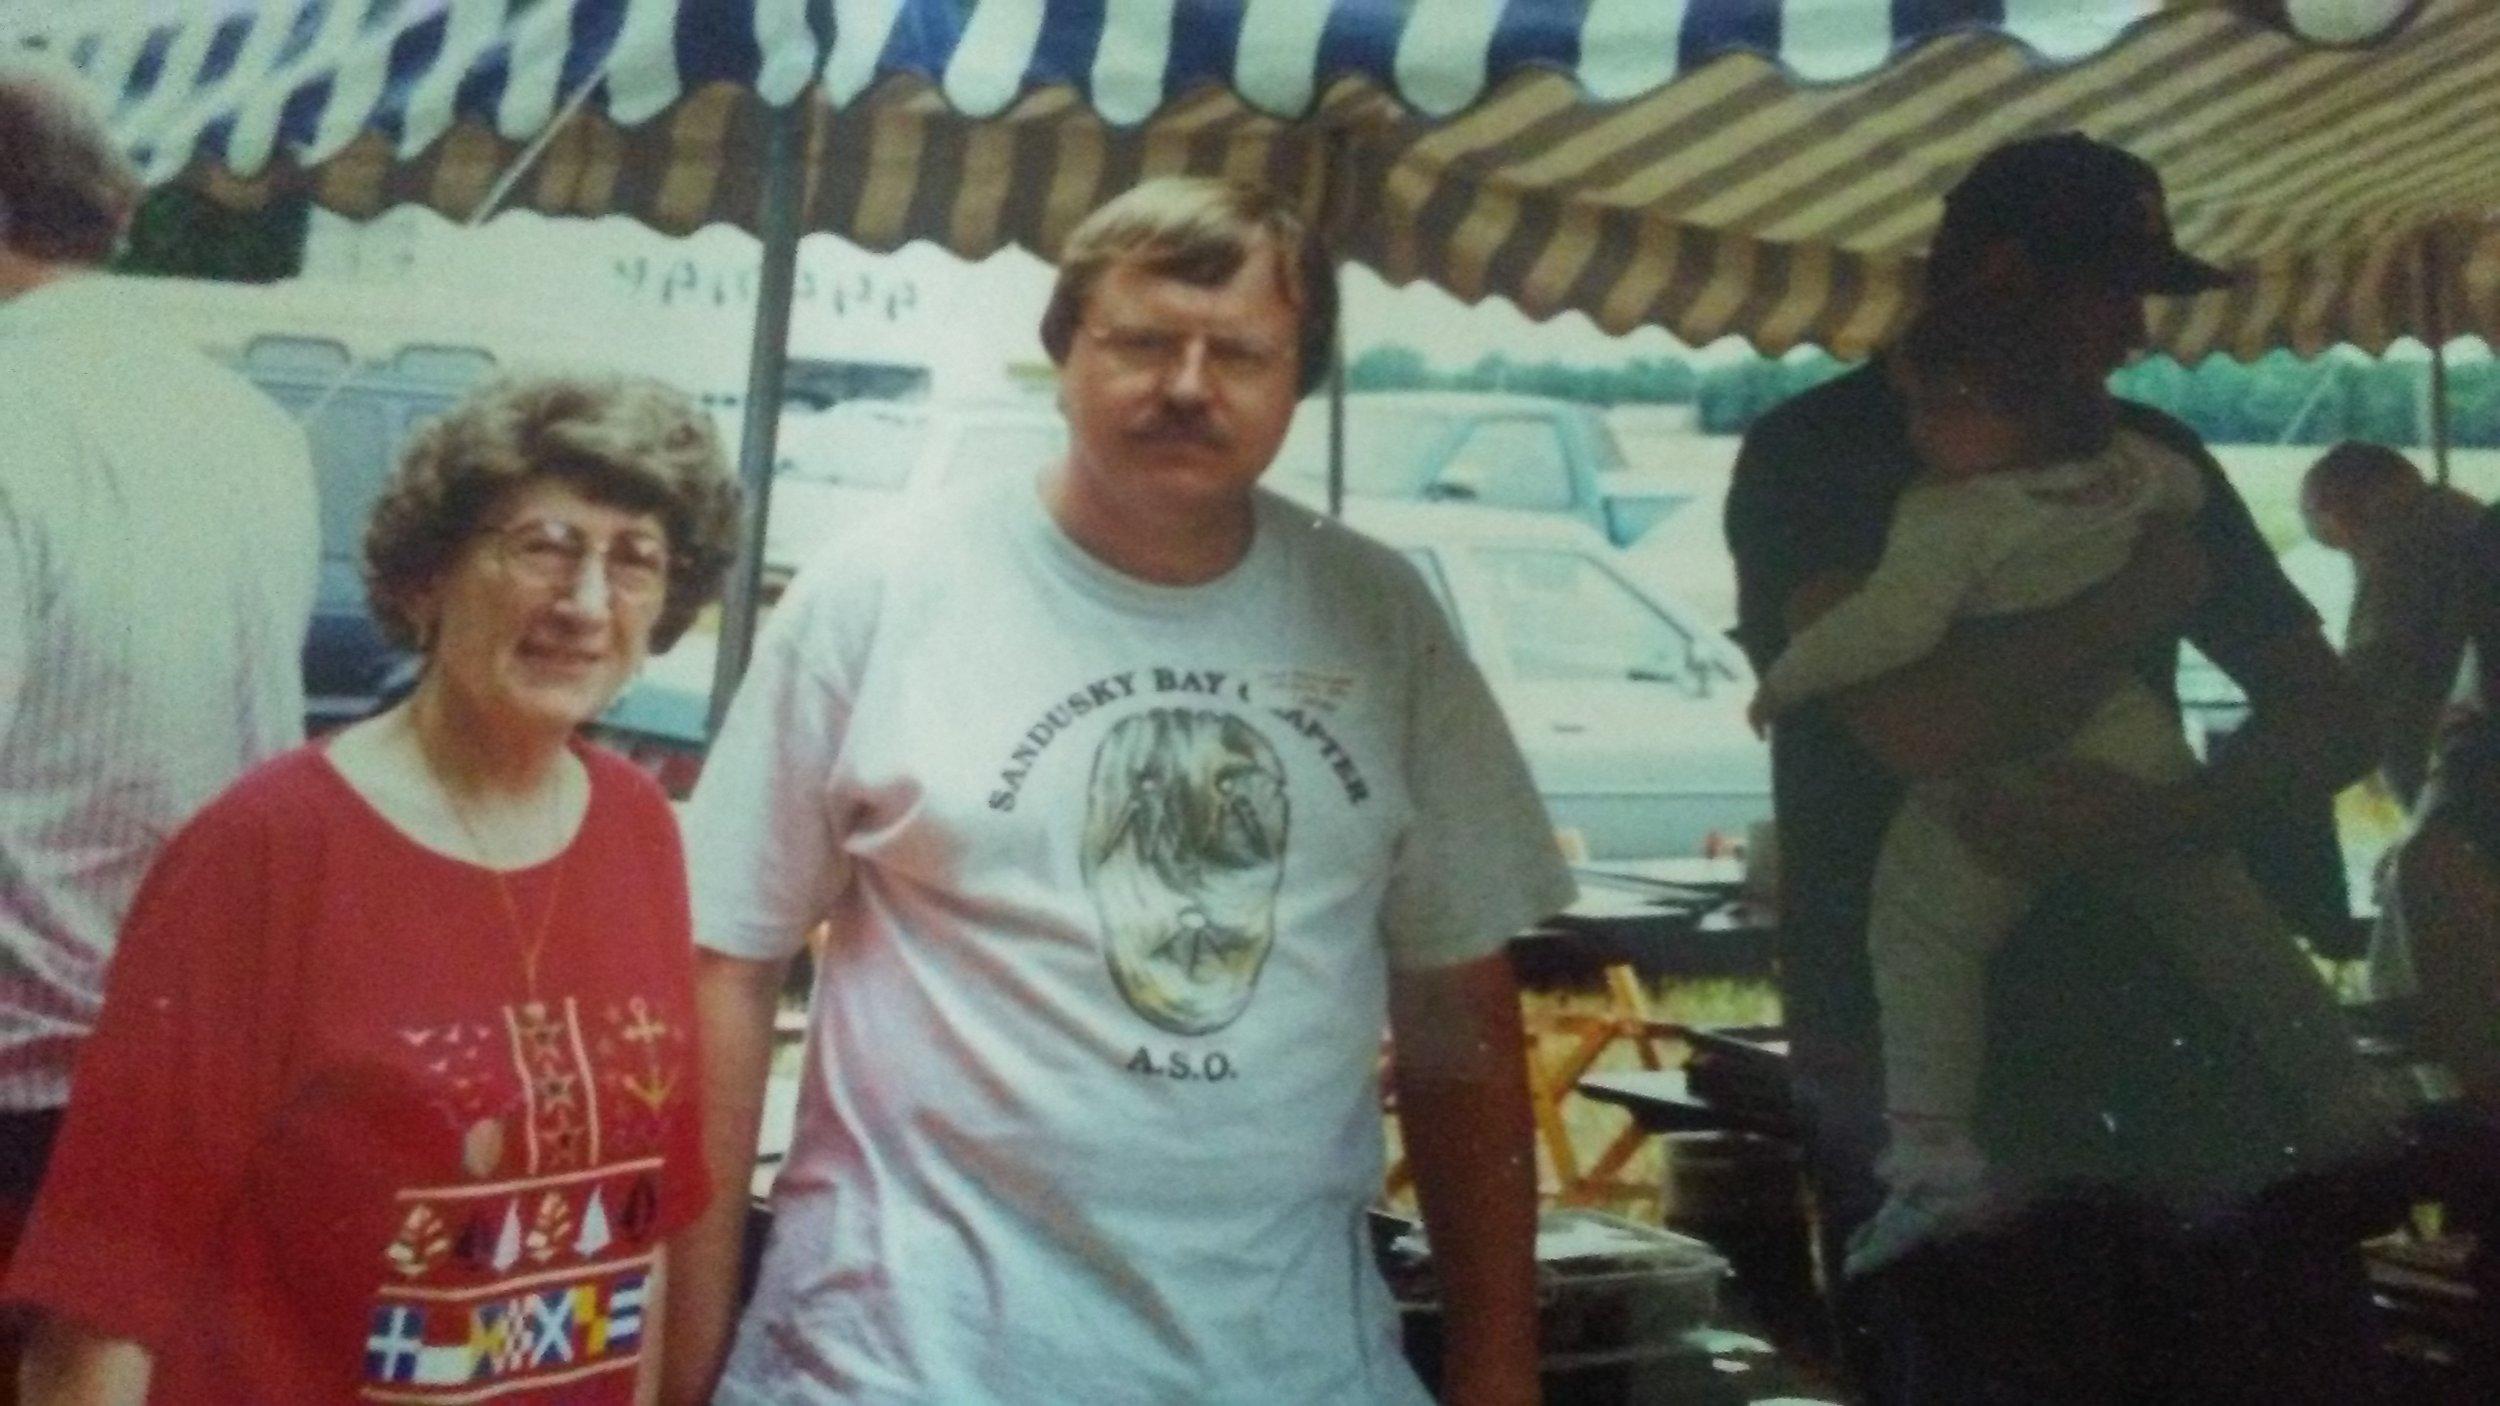 Mrs. Sauer and Dave Boetticher